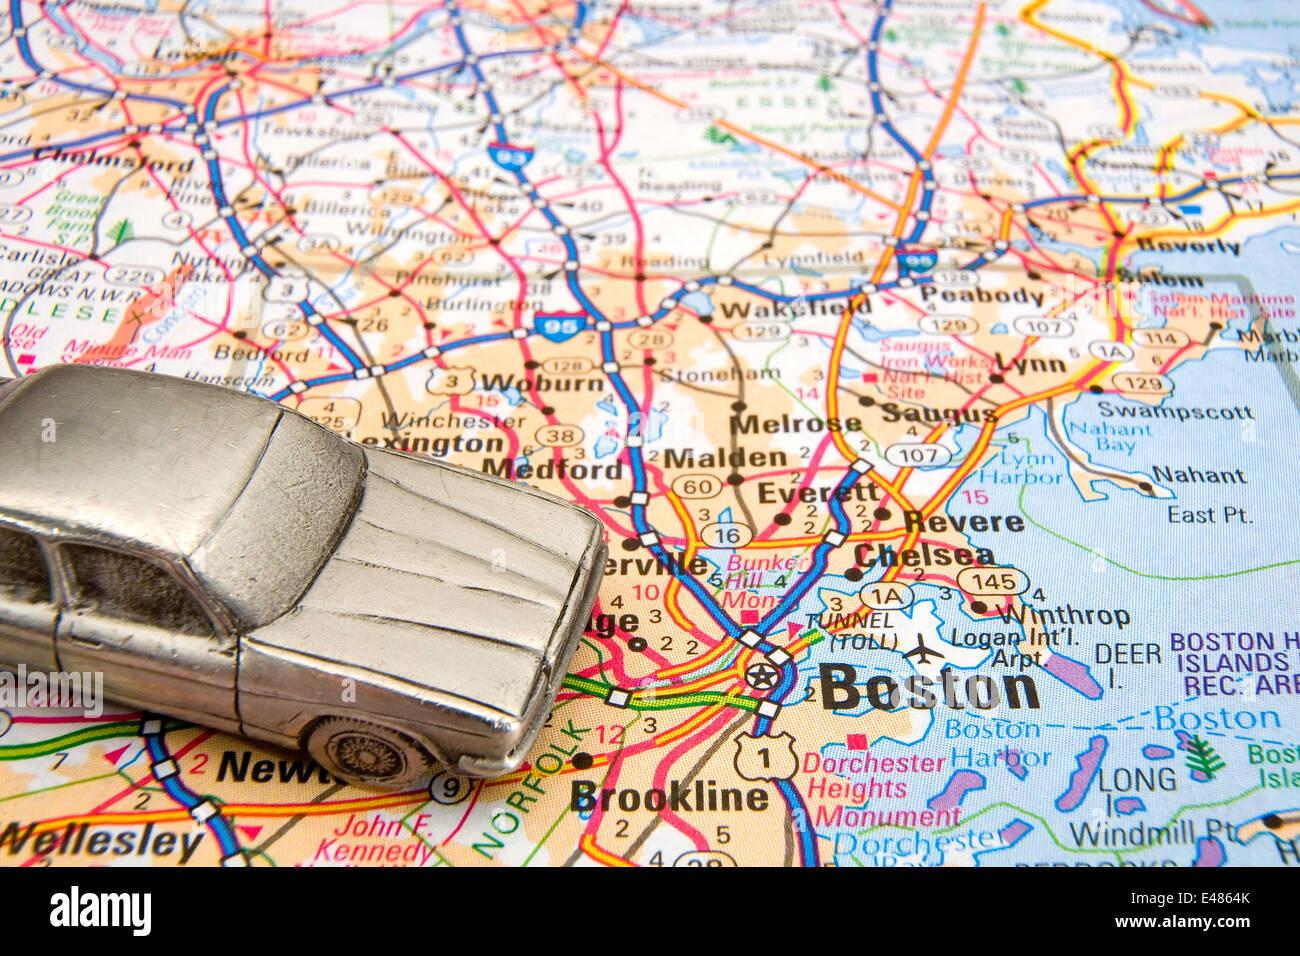 Boston Road Map Model sedan on a road map of Boston MA Stock Photo: 71480547   Alamy